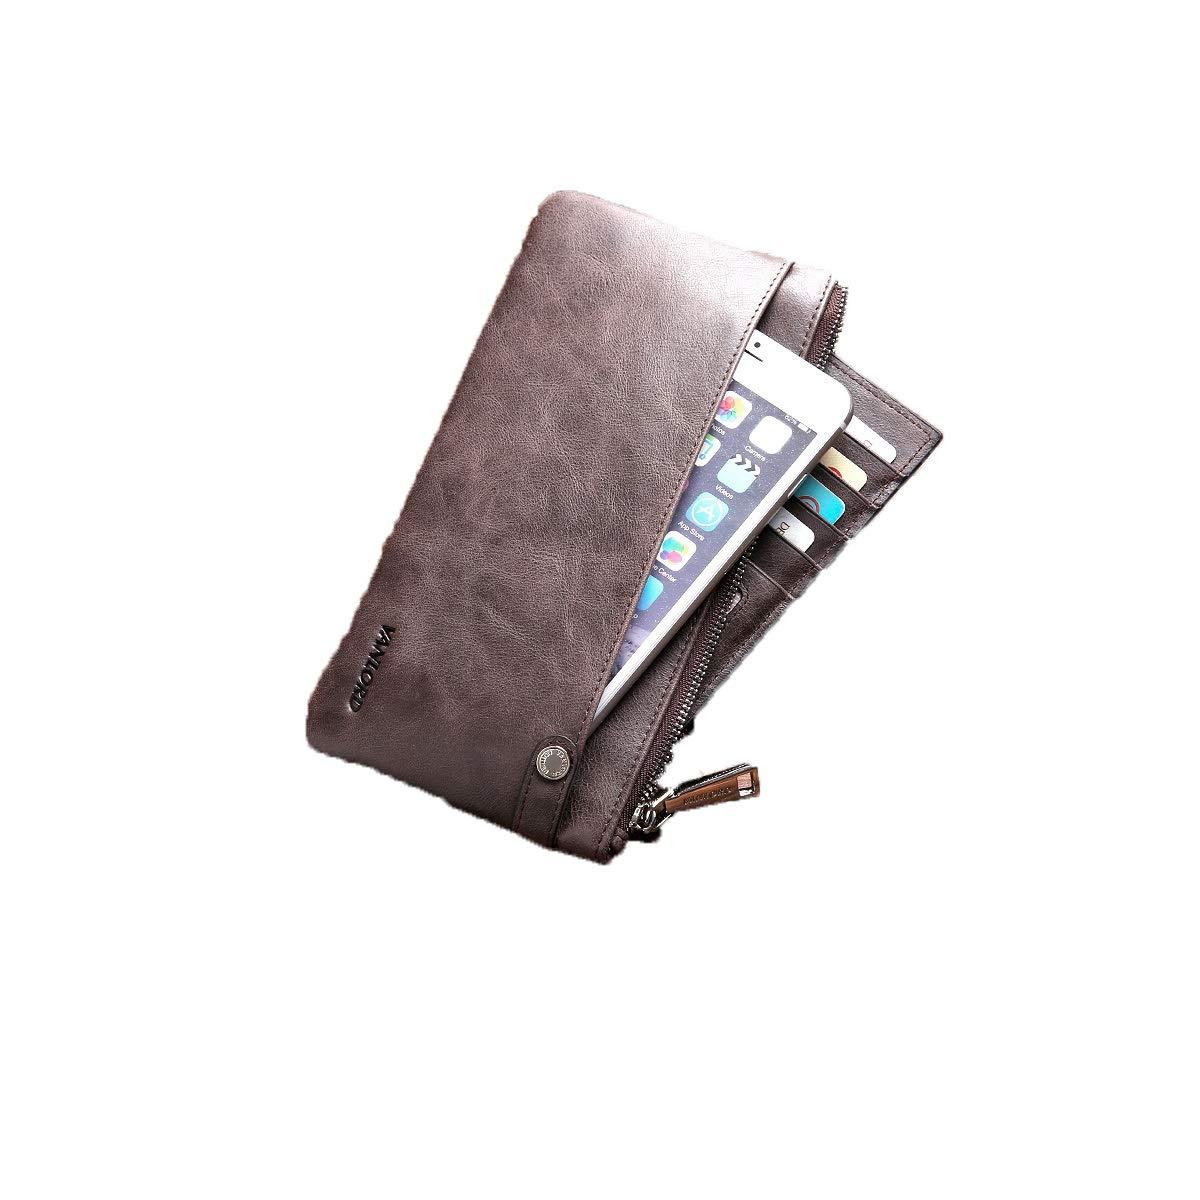 Extra Capacity Travel Wallet Love Gift 8haowenju 2 ID Window RFID Wallet for Men Bifold Side Flip